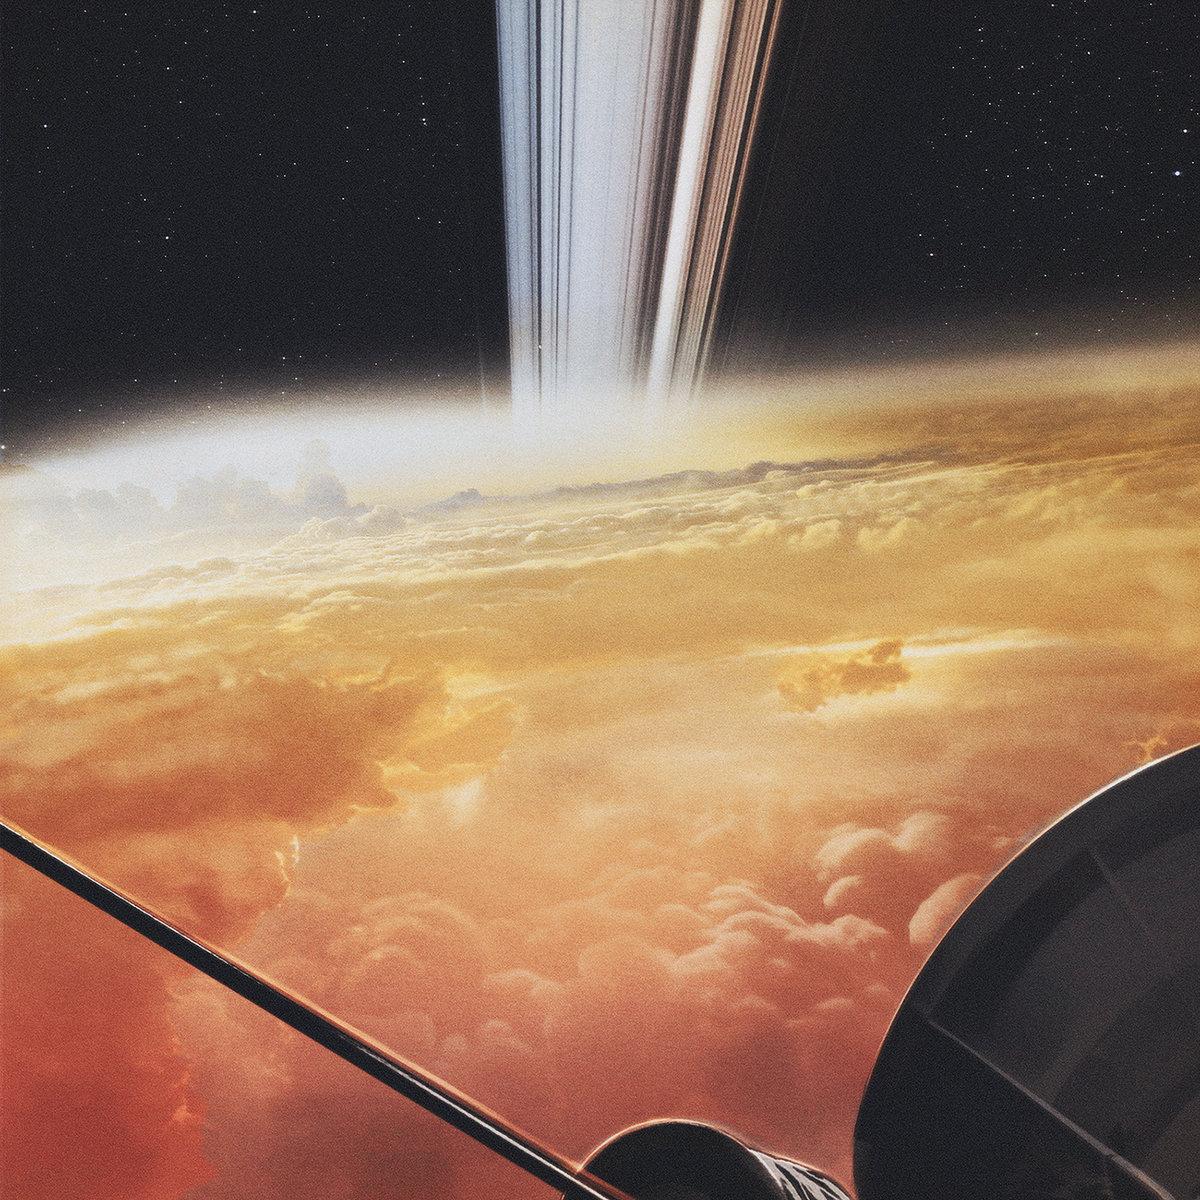 2MR-041 – John Barera, Will Martin – Life, The Heavens and Earth 12″ EP